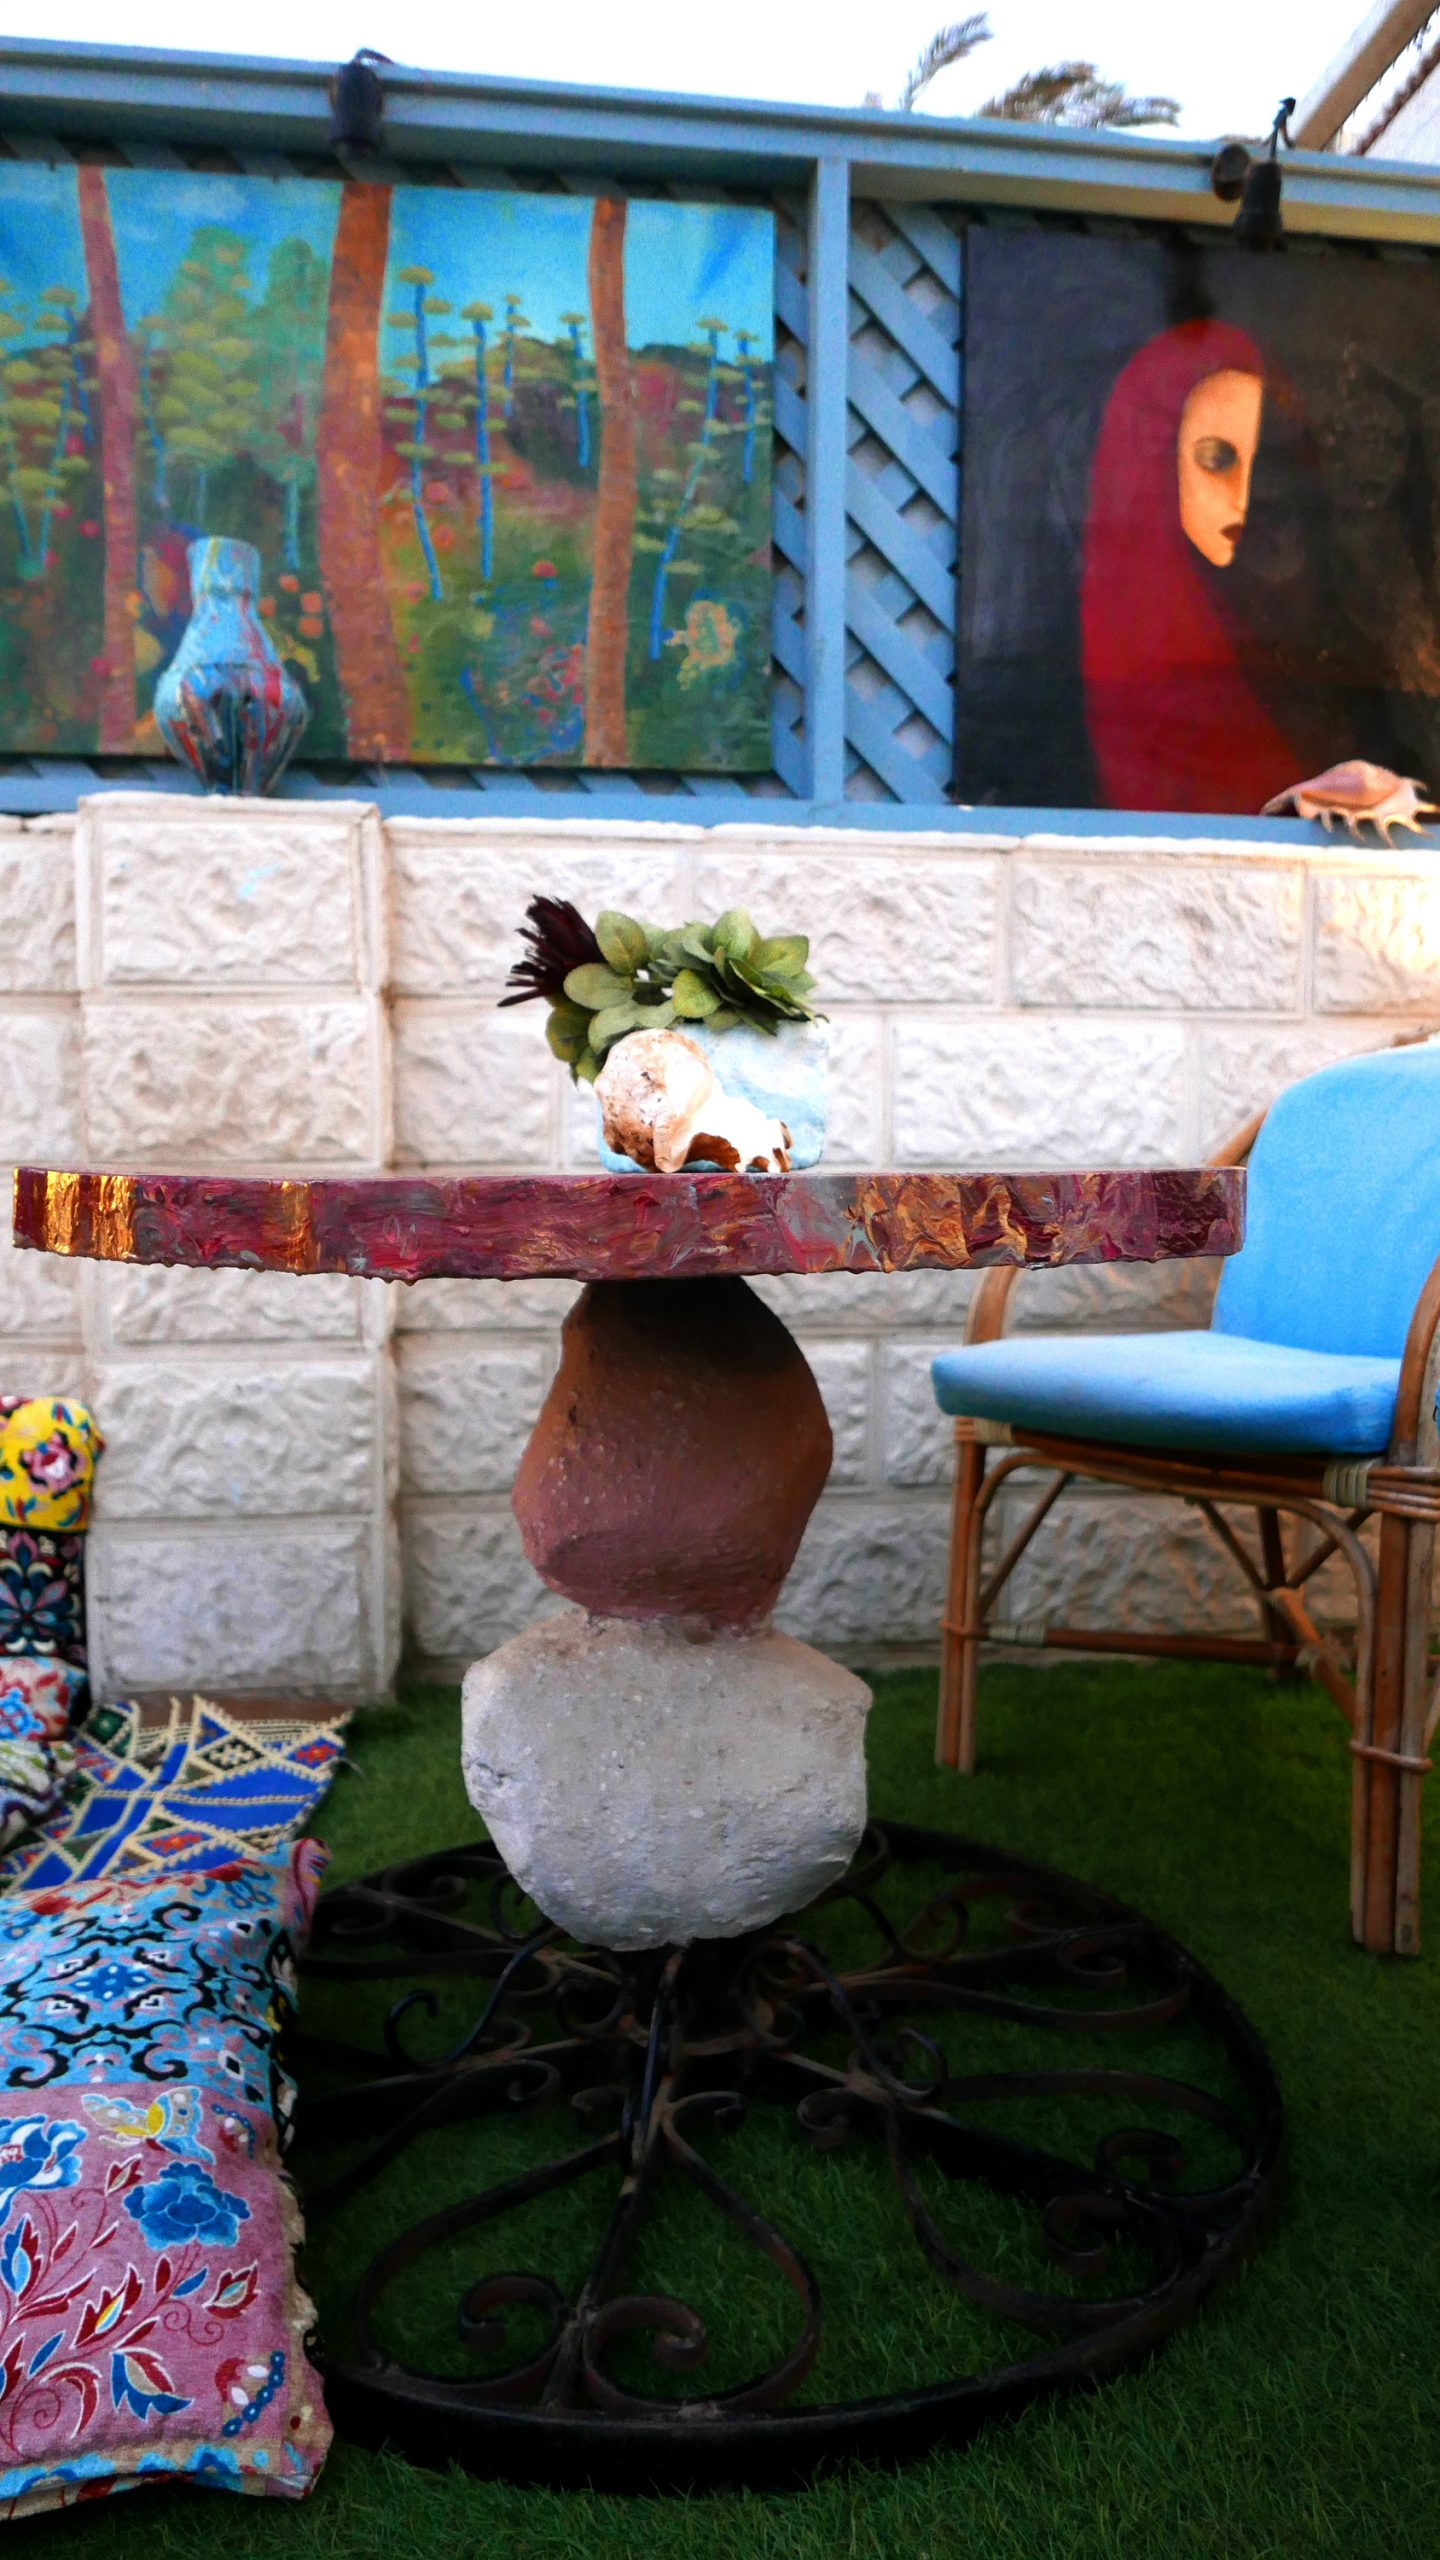 sky rock dahab art hotel egypt travel films